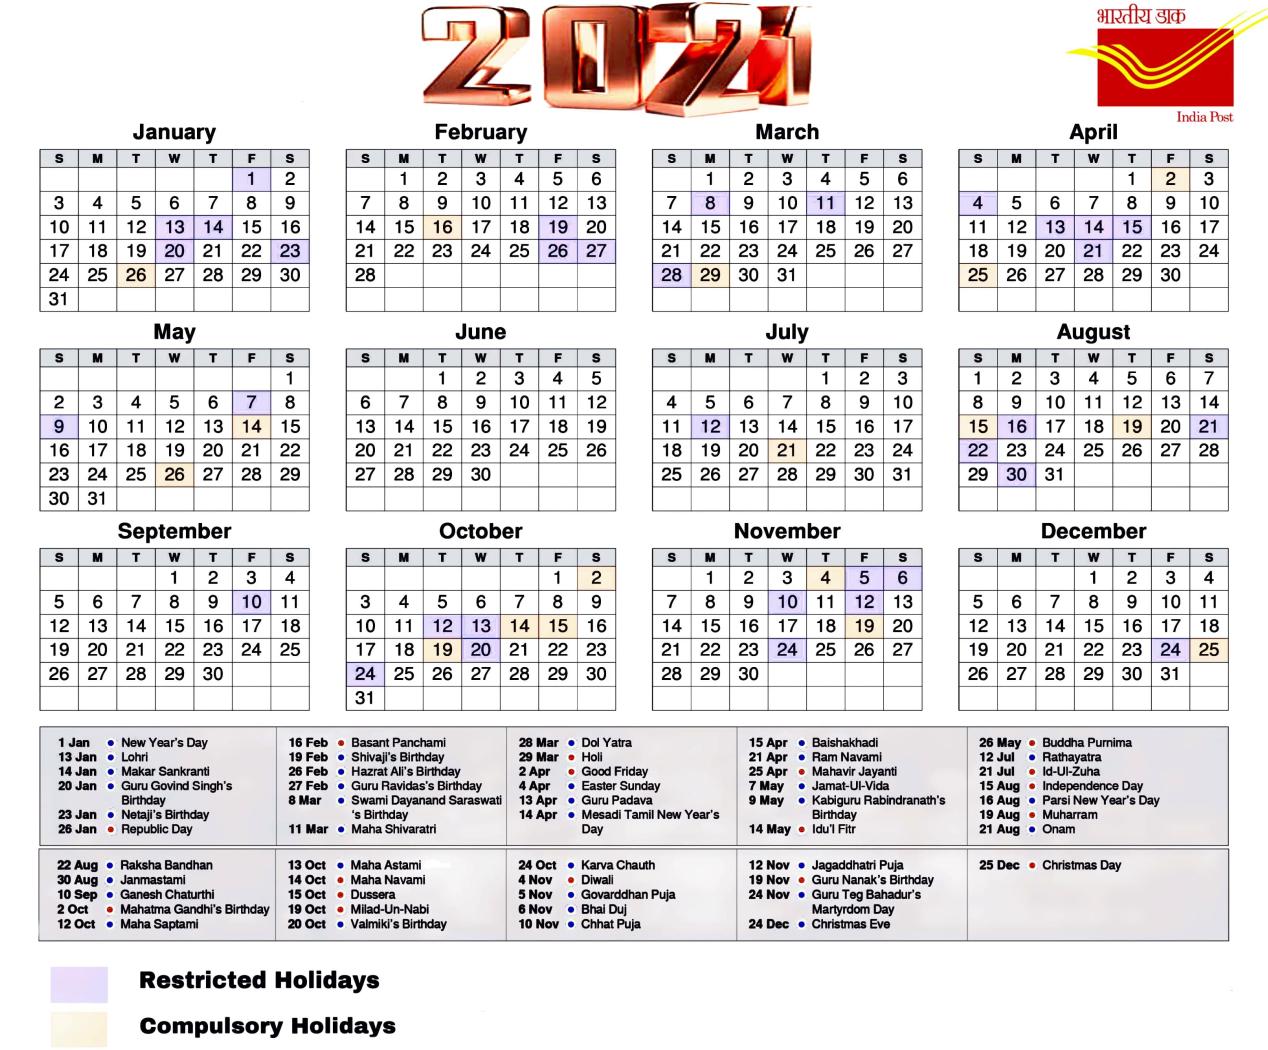 Postal Calendar 2021 - Update Restricted And Compulsory-2021 Employee Vacation Calendar